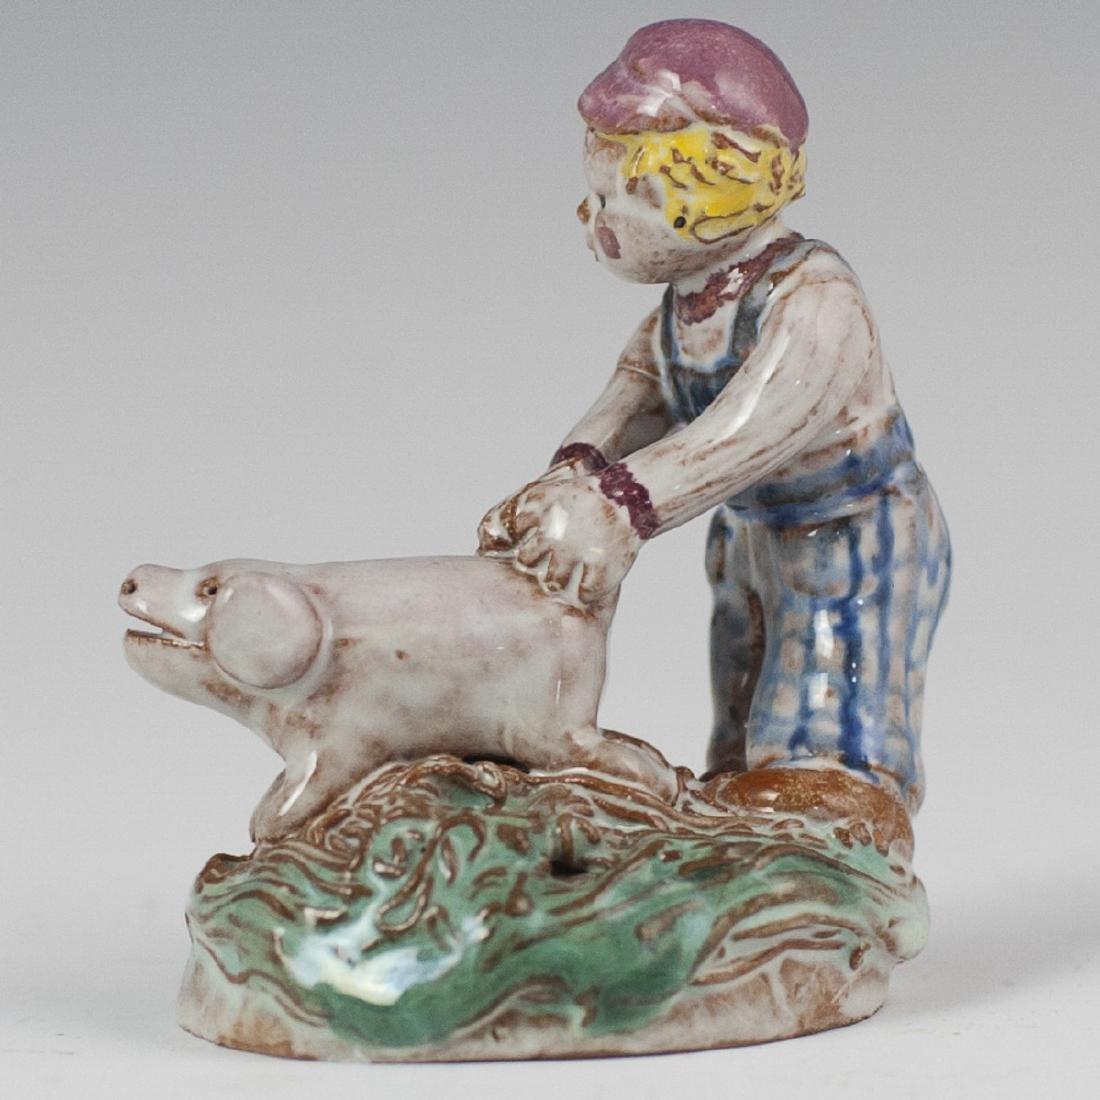 Vintage Glazed Pottery Figurine